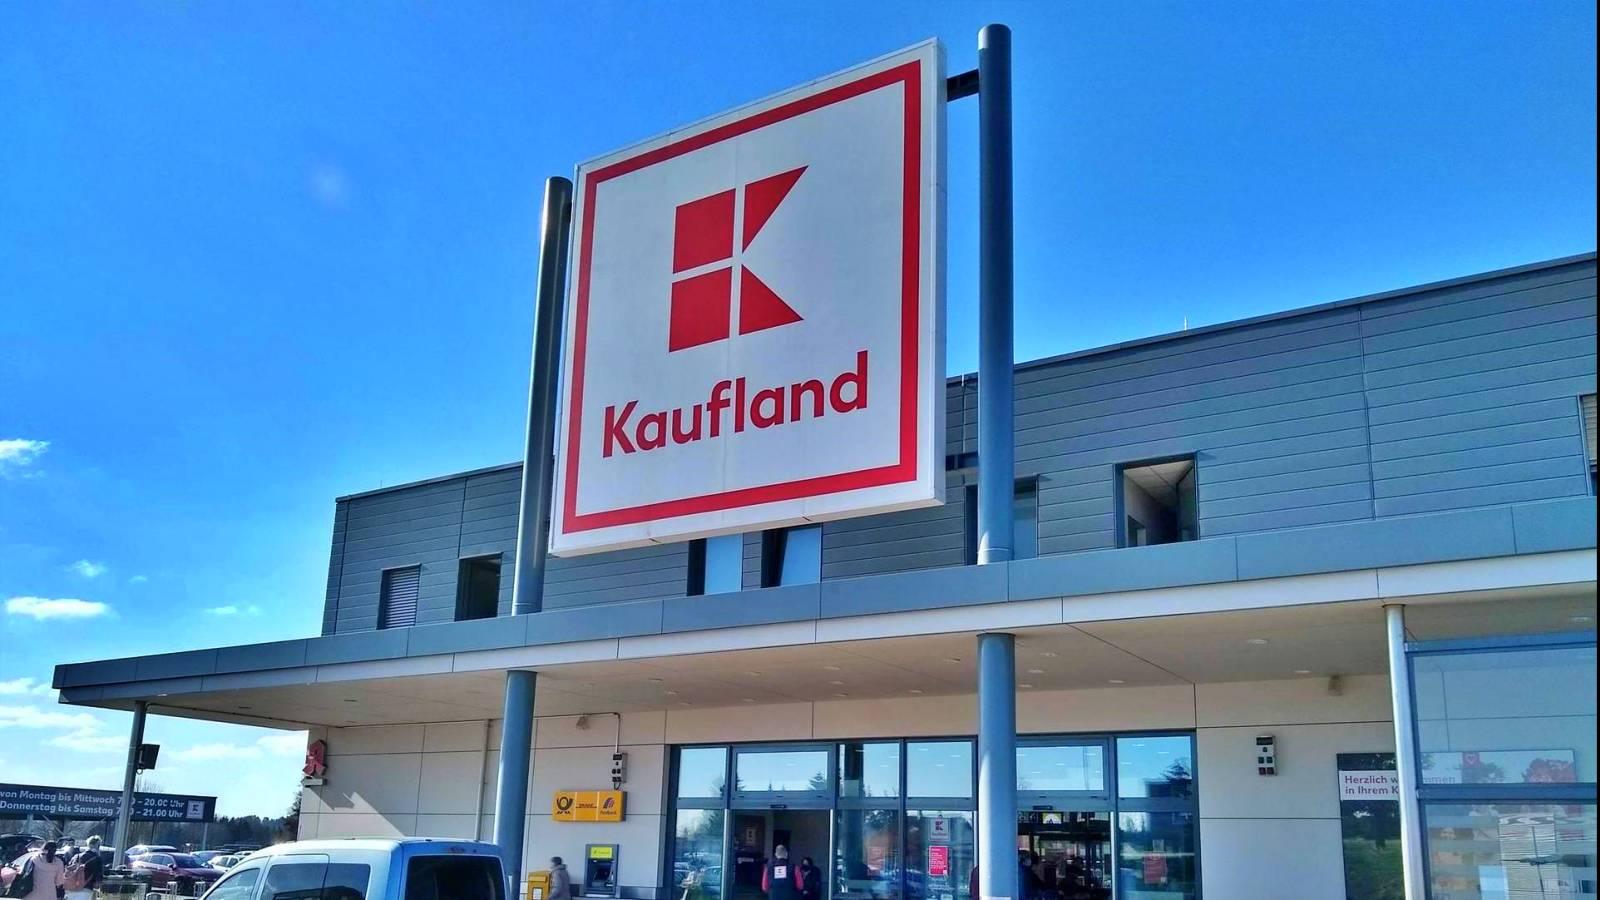 Kaufland: Schimbari in Romania, ce a Anuntat pentru Clienti thumbnail